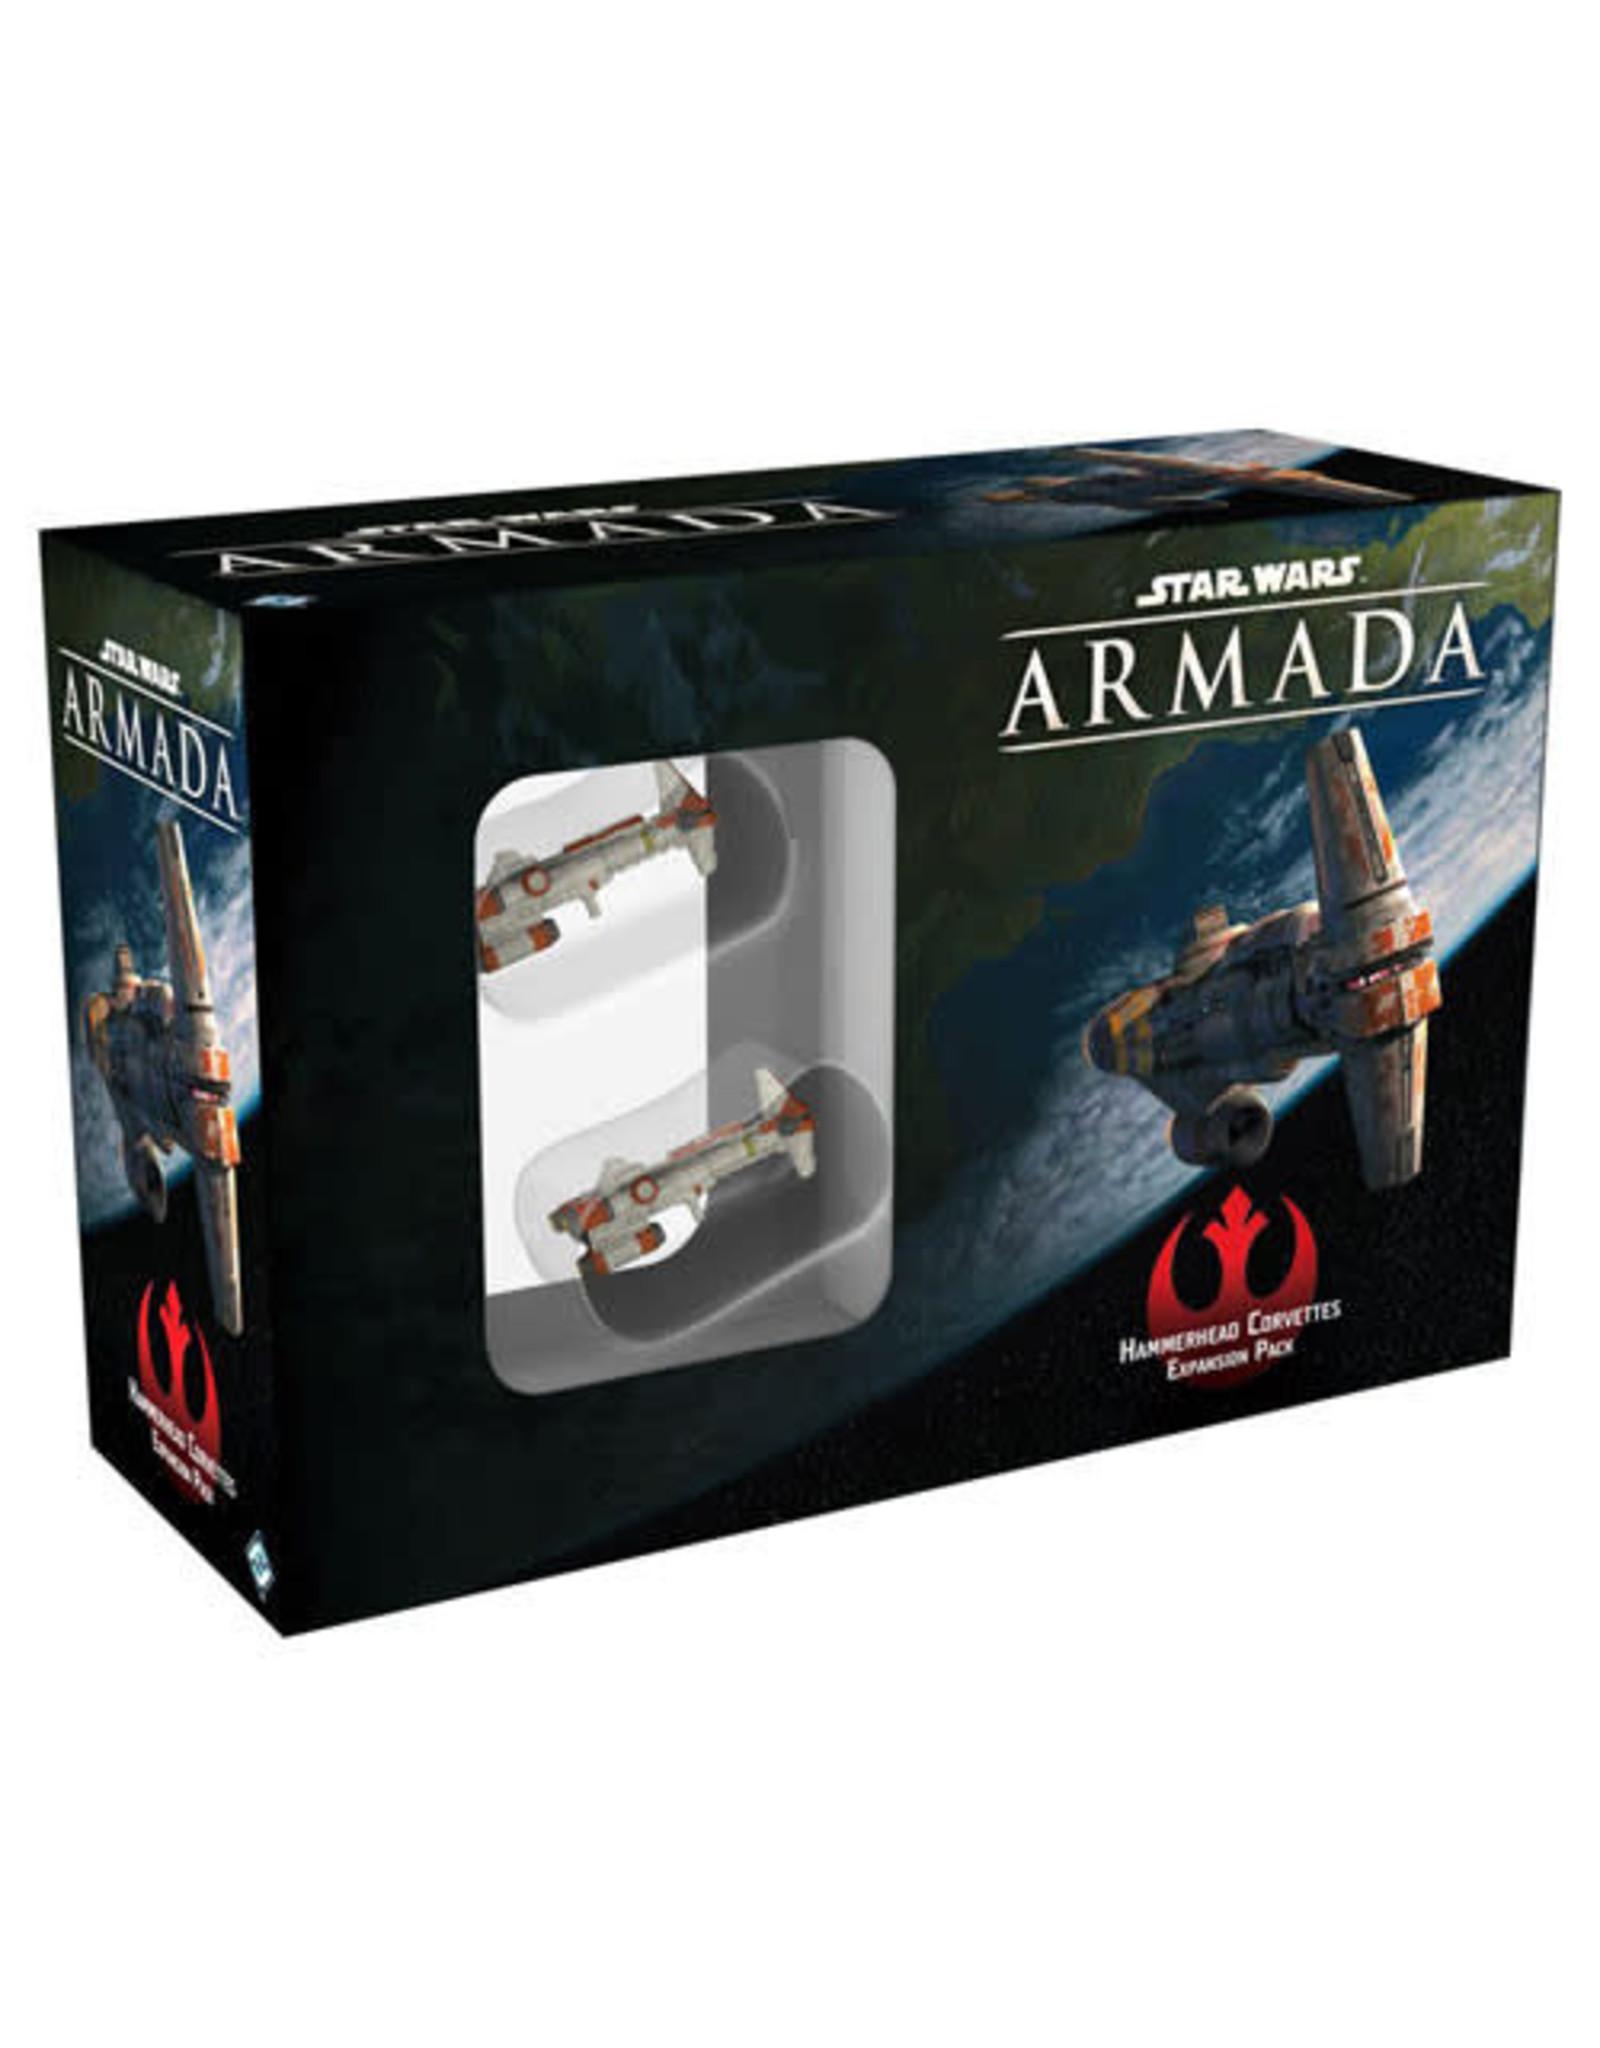 Fantasy Flight Games Star Wars Armada: Hammerhead Corvette Expansion Pack